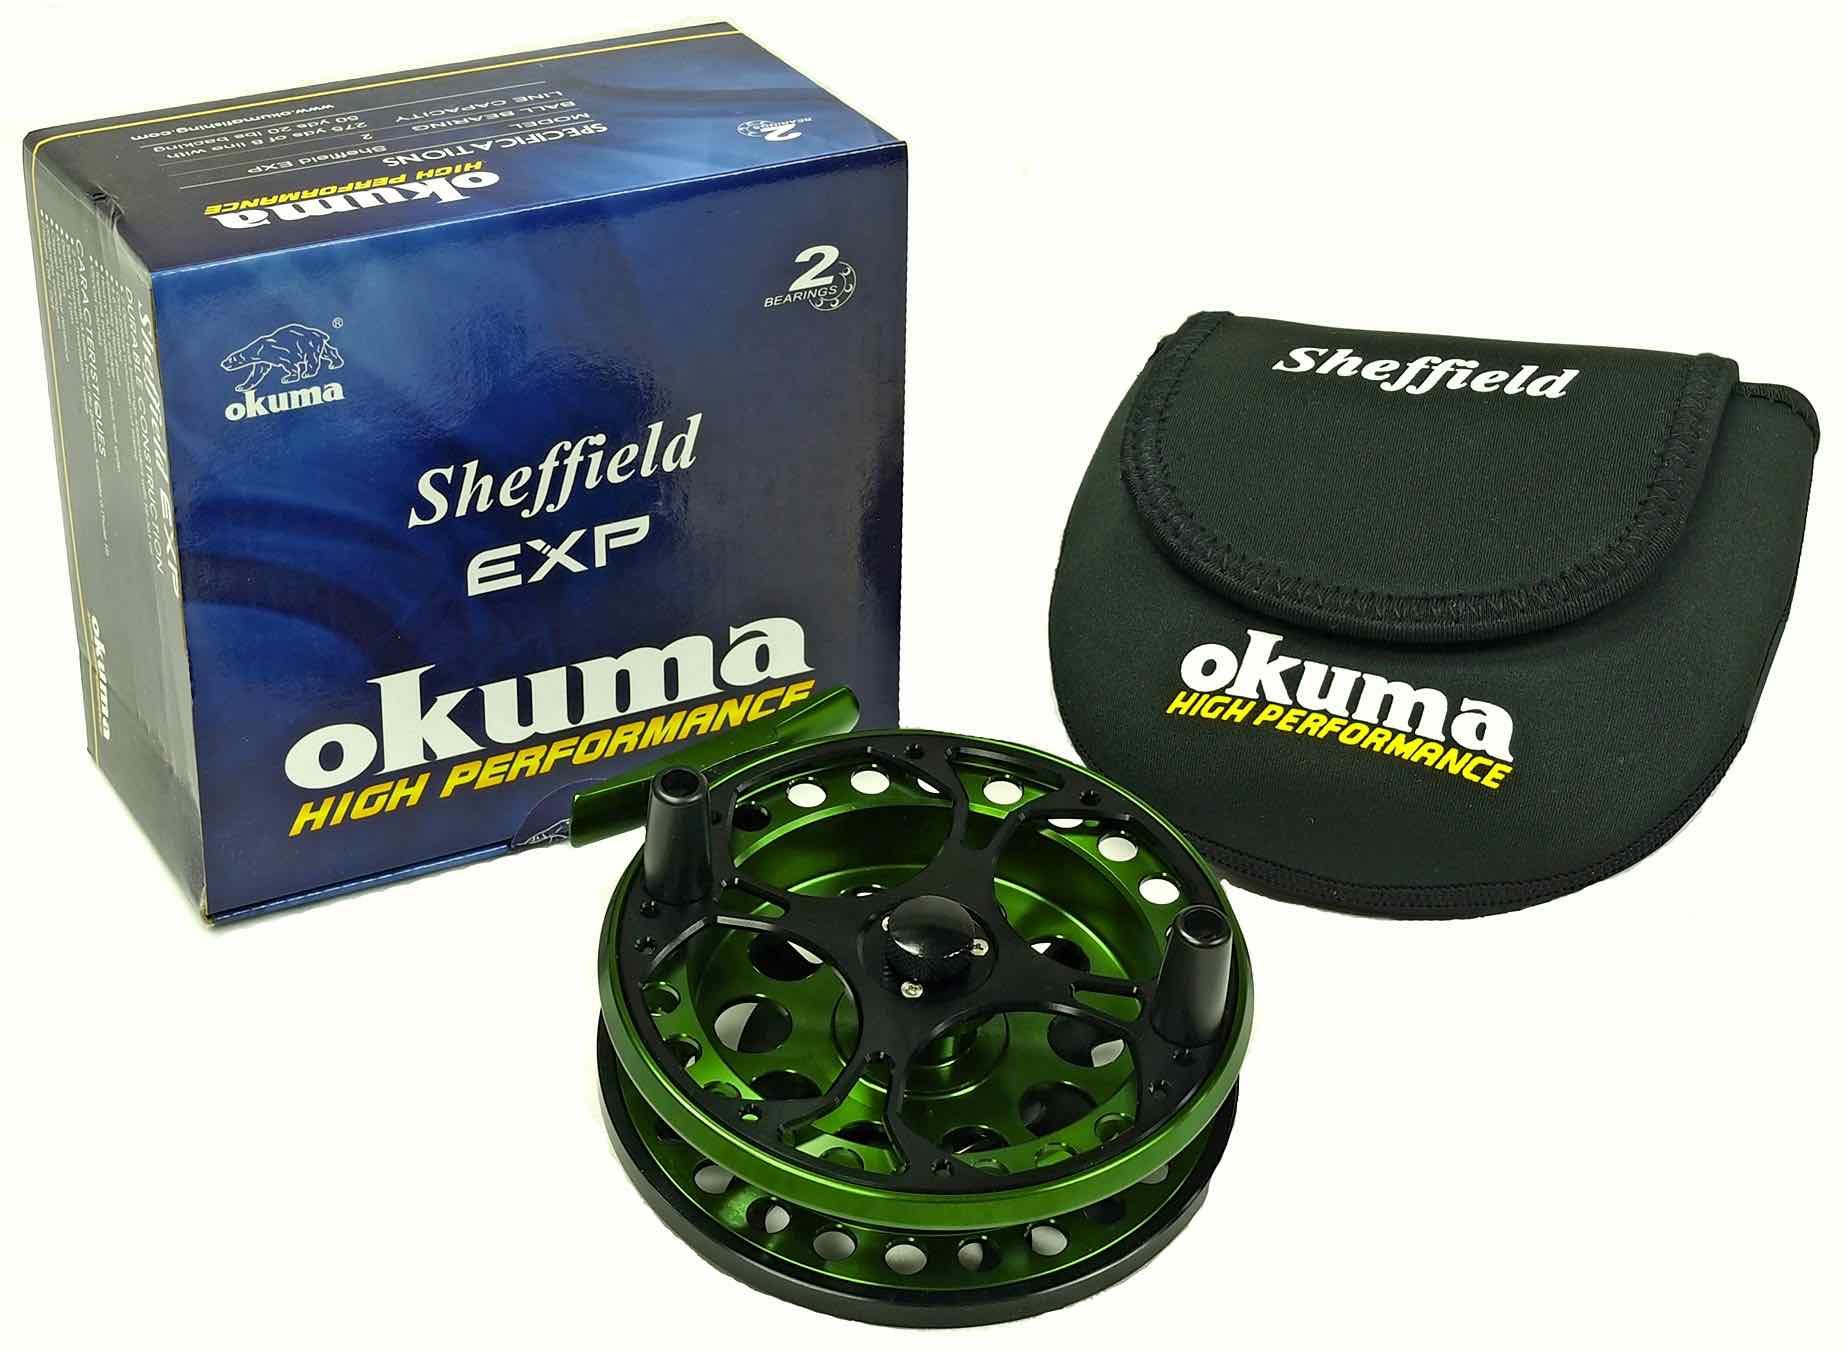 Okuma-Sheffield-EXP-Centerpin-Float-Reel